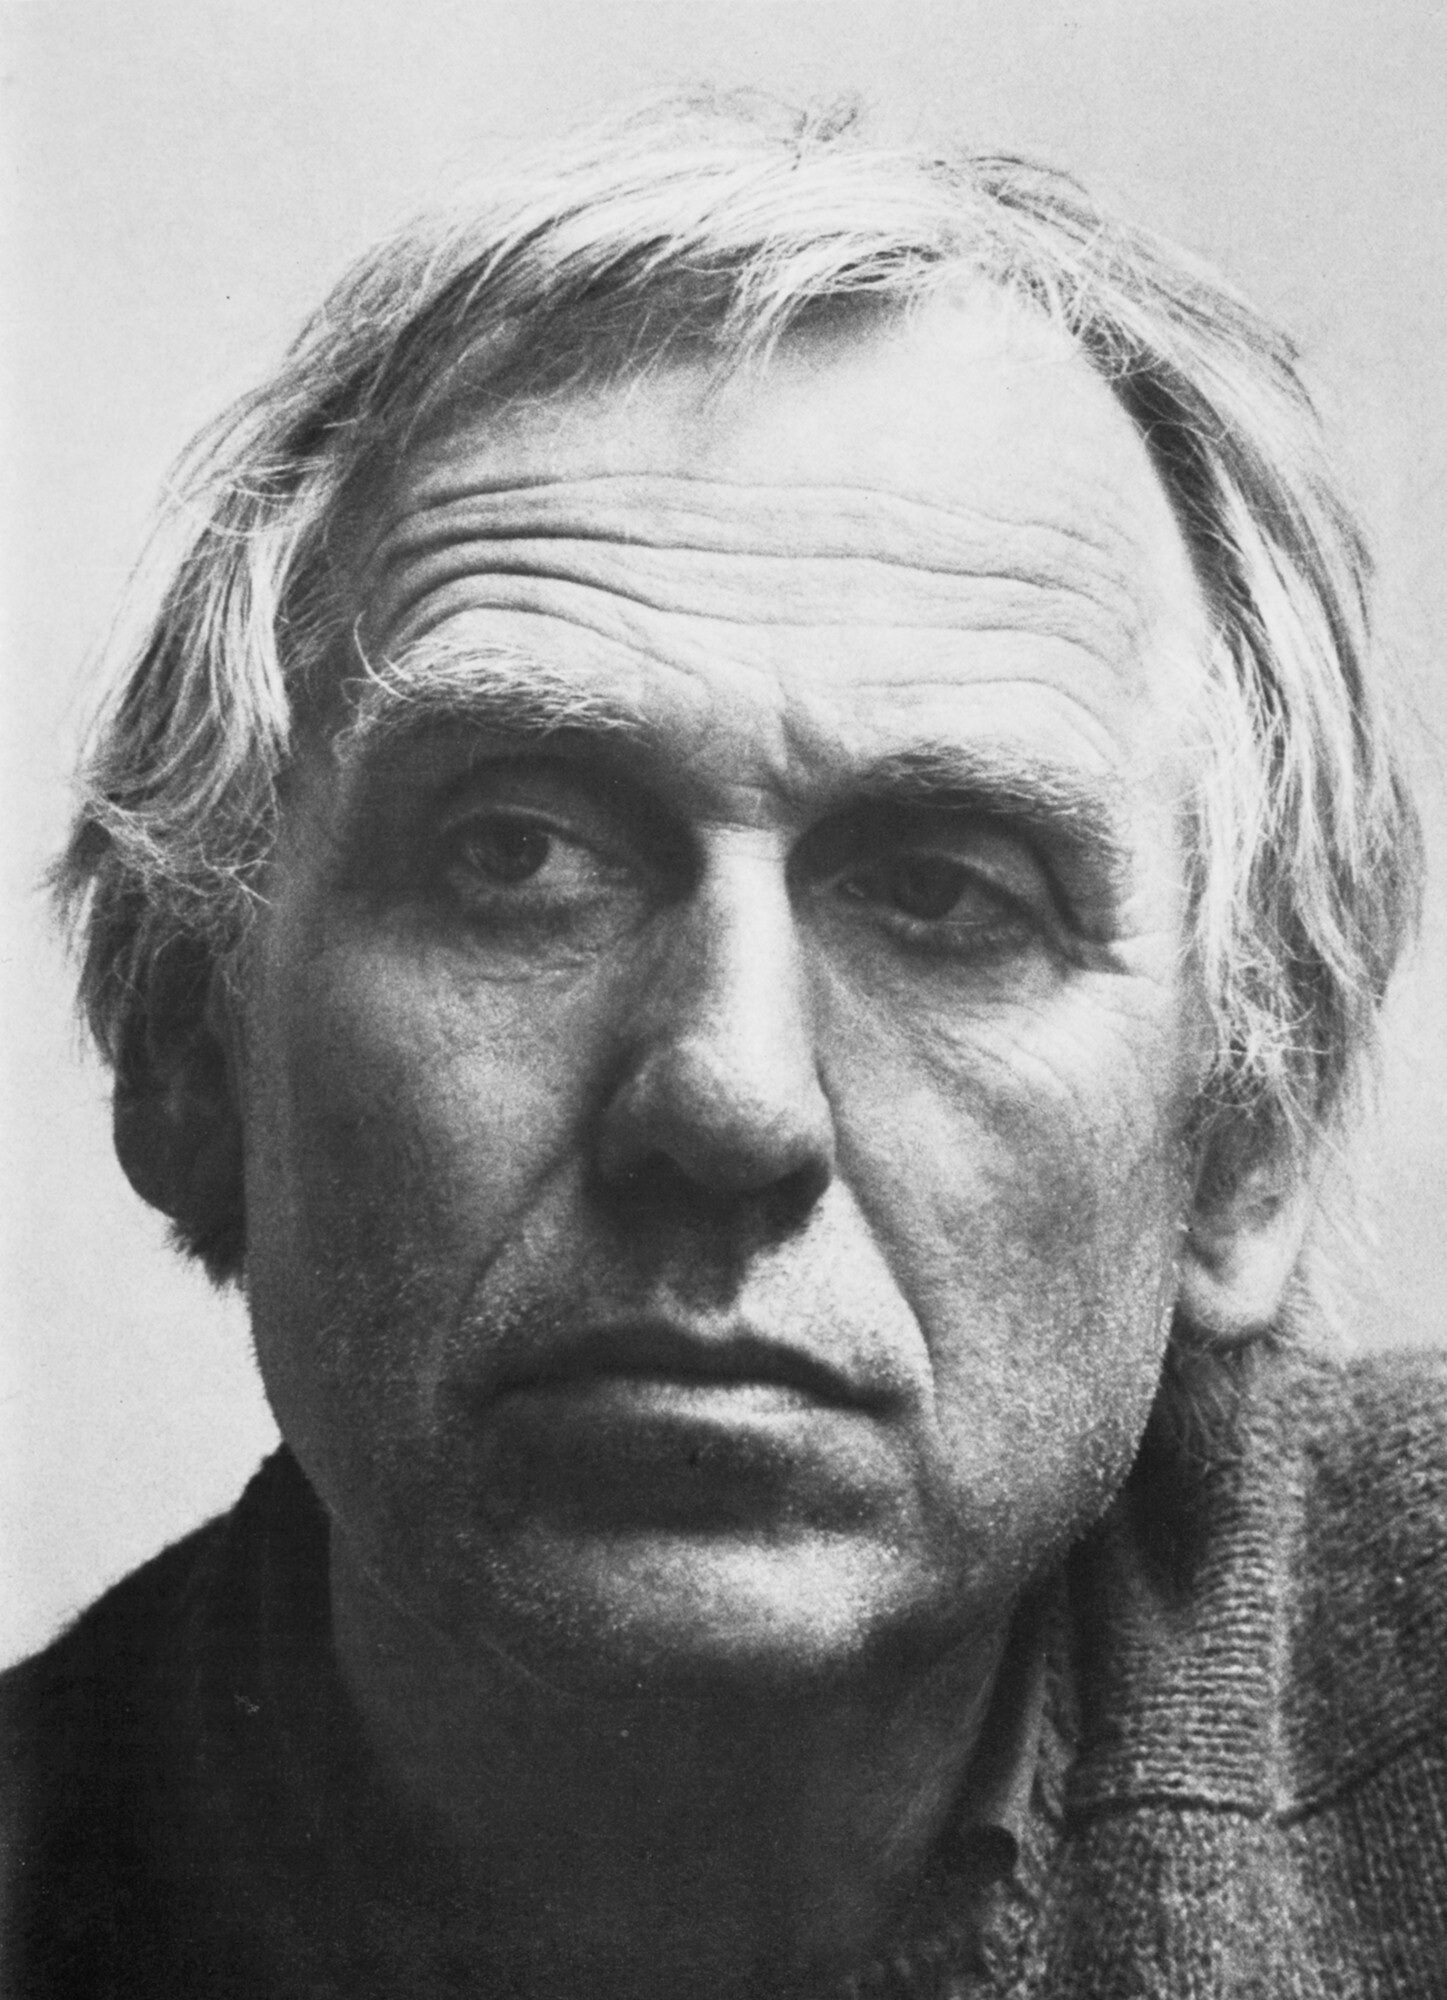 Waldemar Grzimek, Porträt, 1943